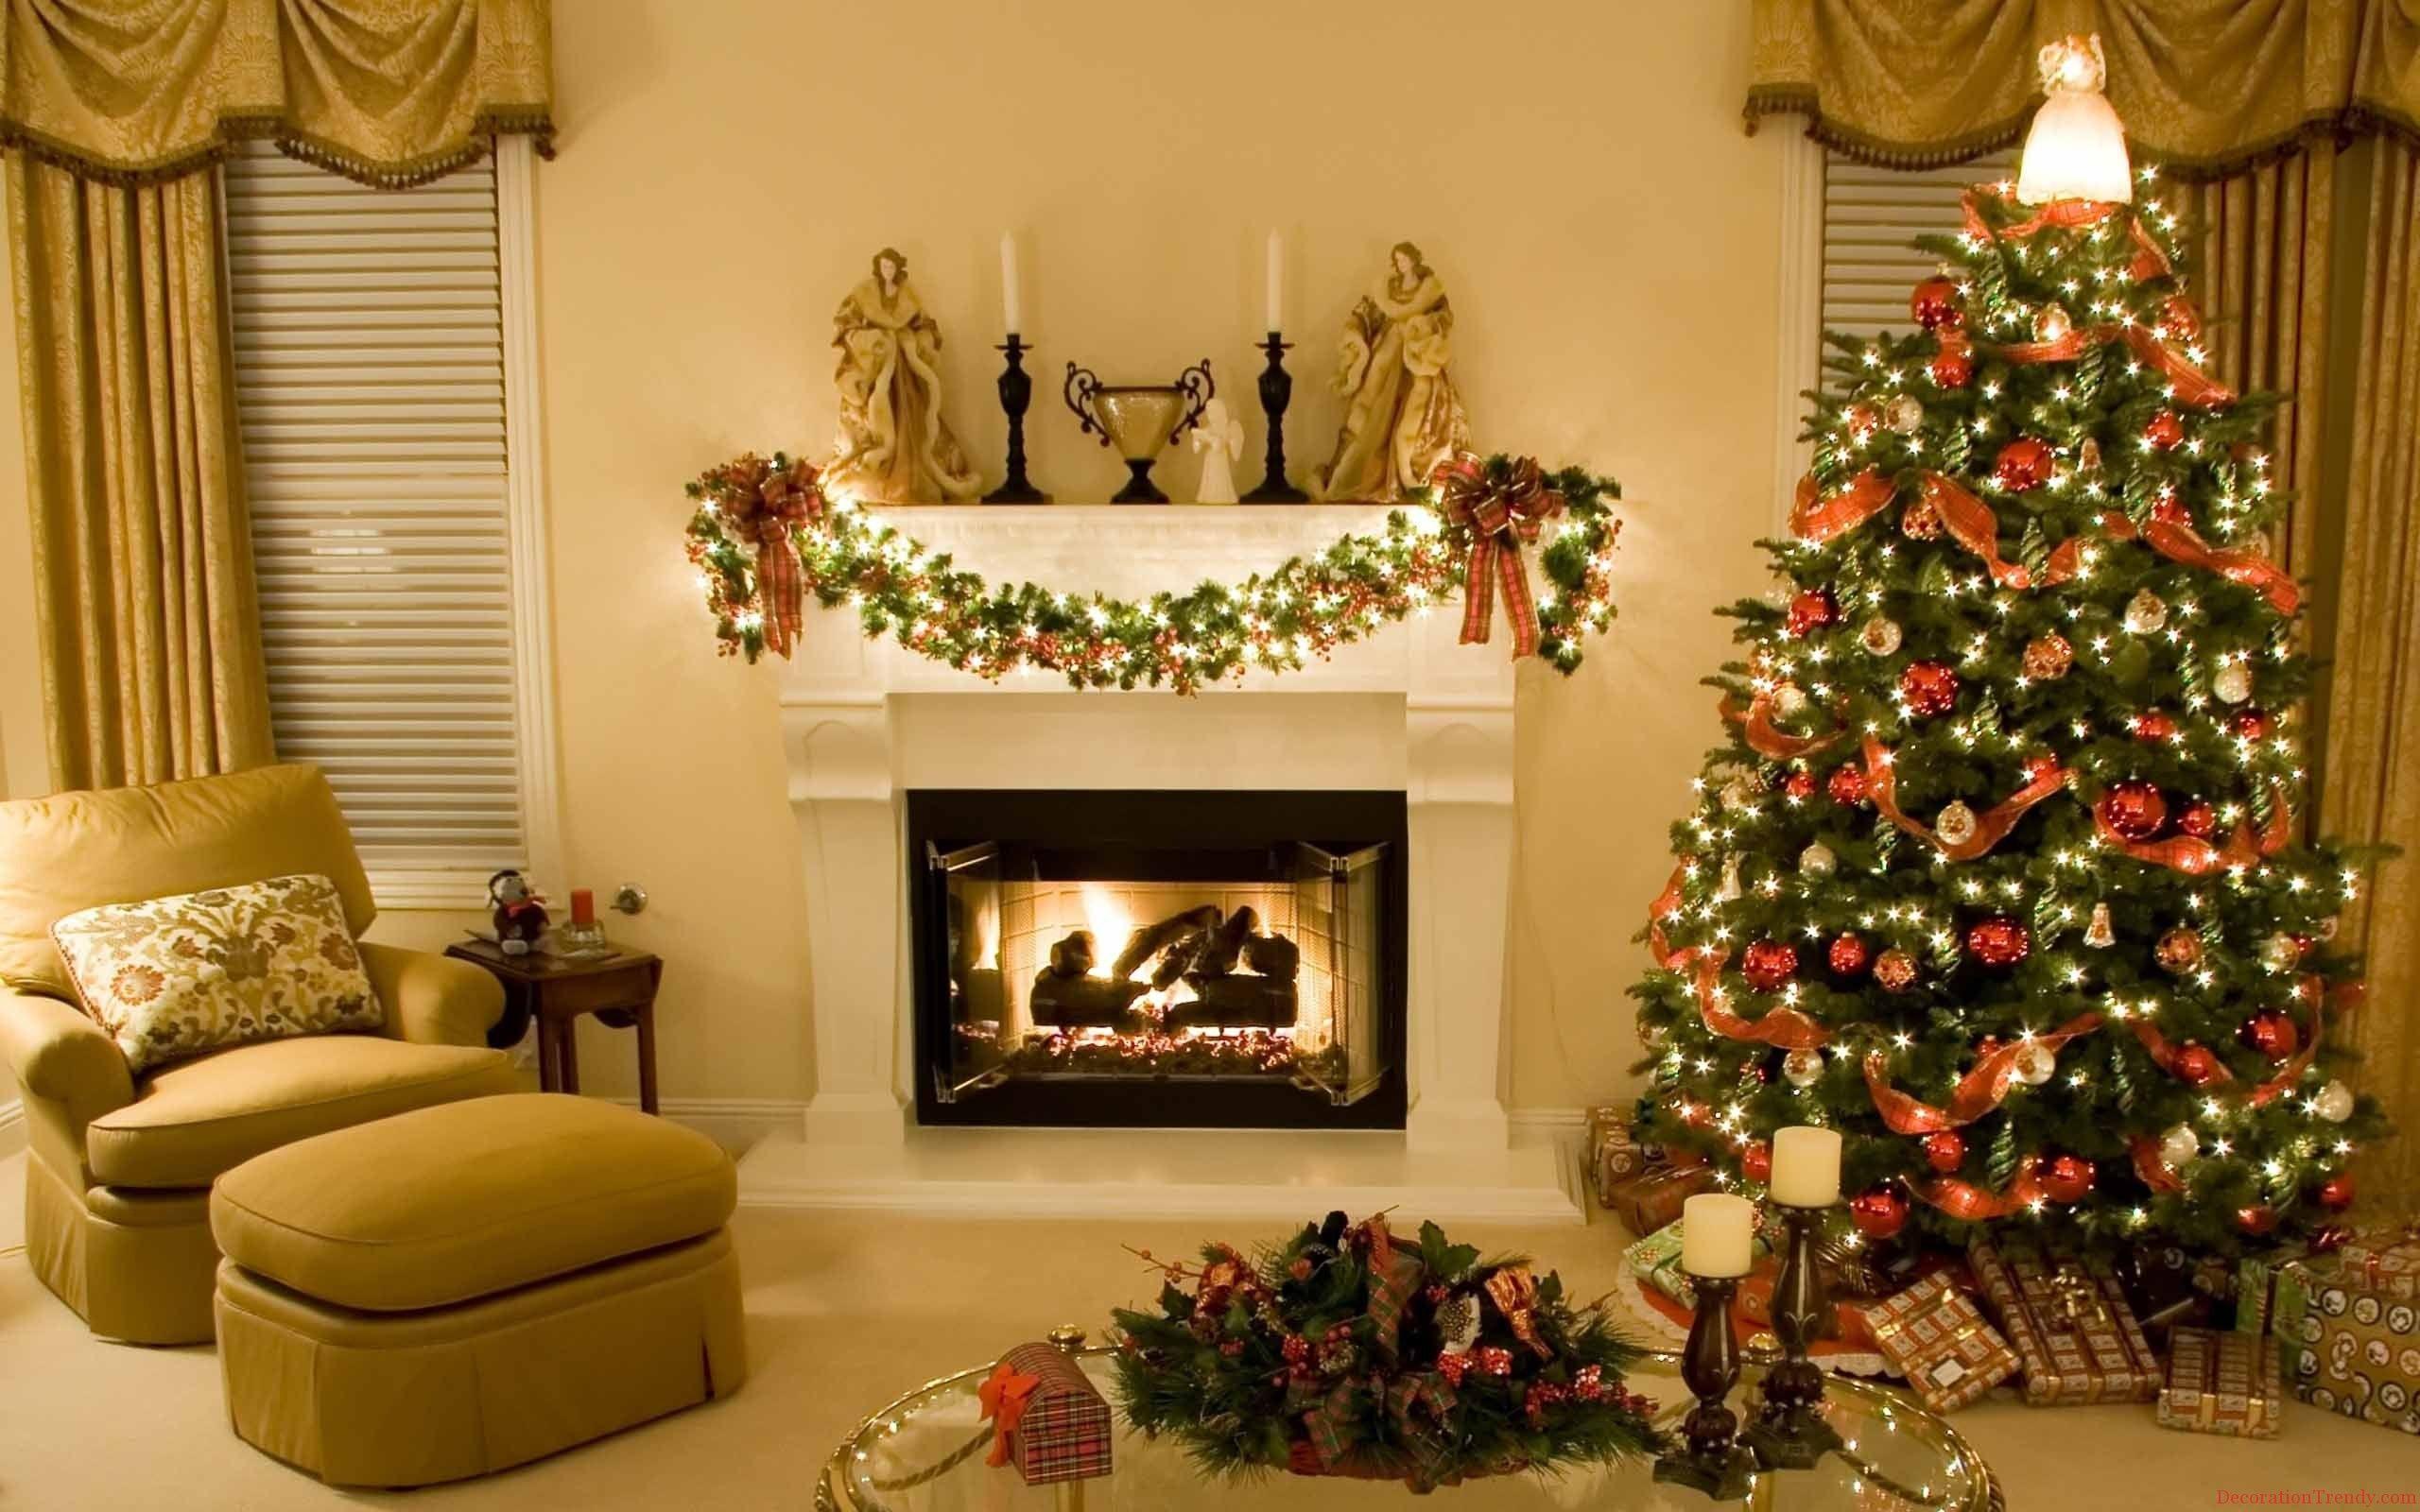 Image result for home decor for christmas | CHRISTMAS HOME DECOR ...